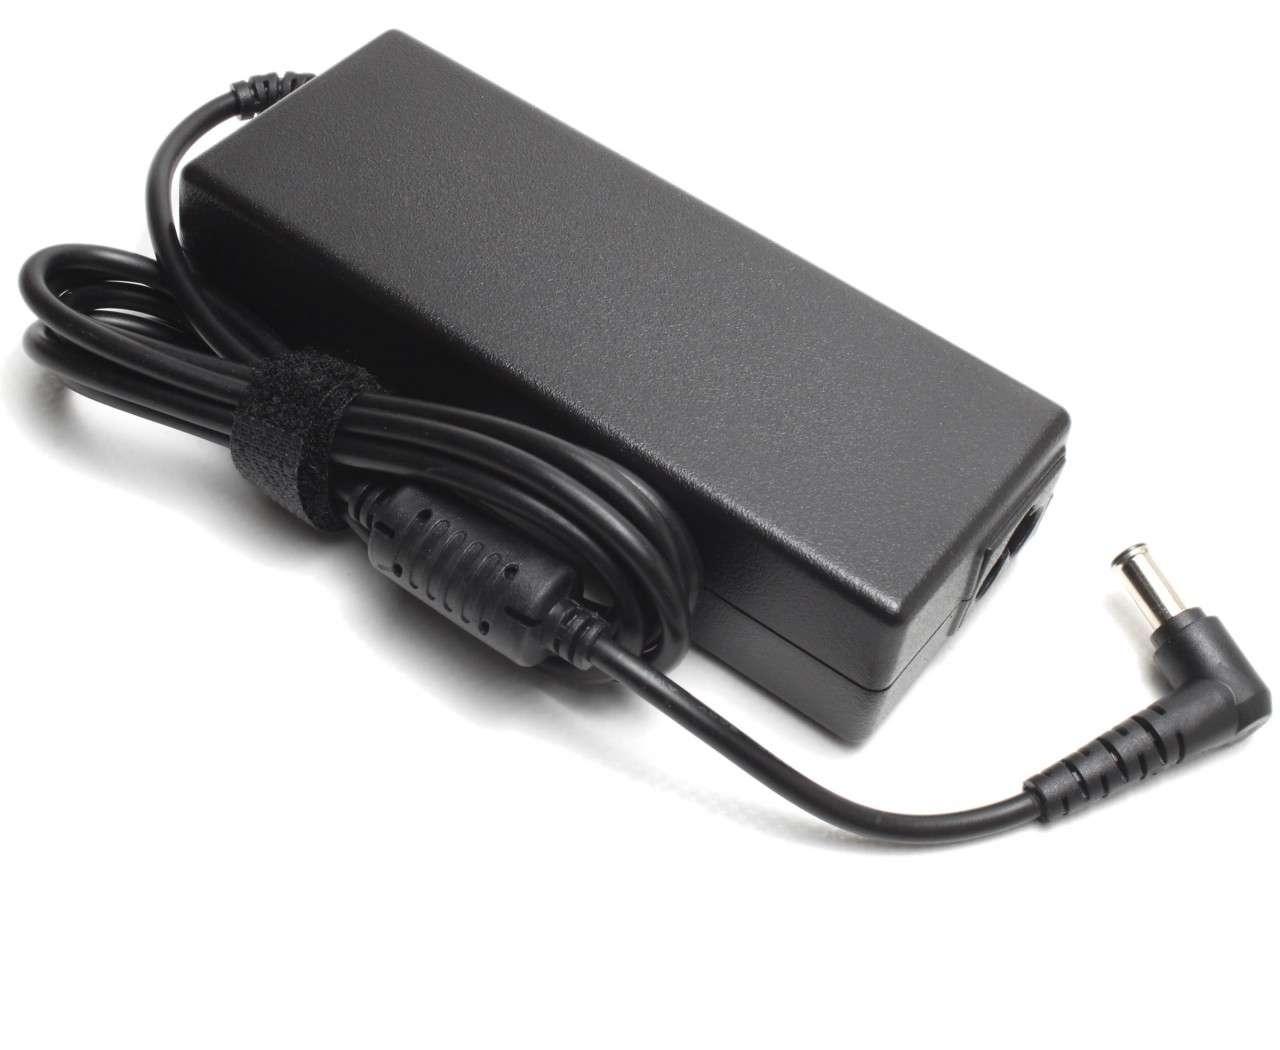 Incarcator Sony Vaio VPCEA3LGX Replacement imagine powerlaptop.ro 2021